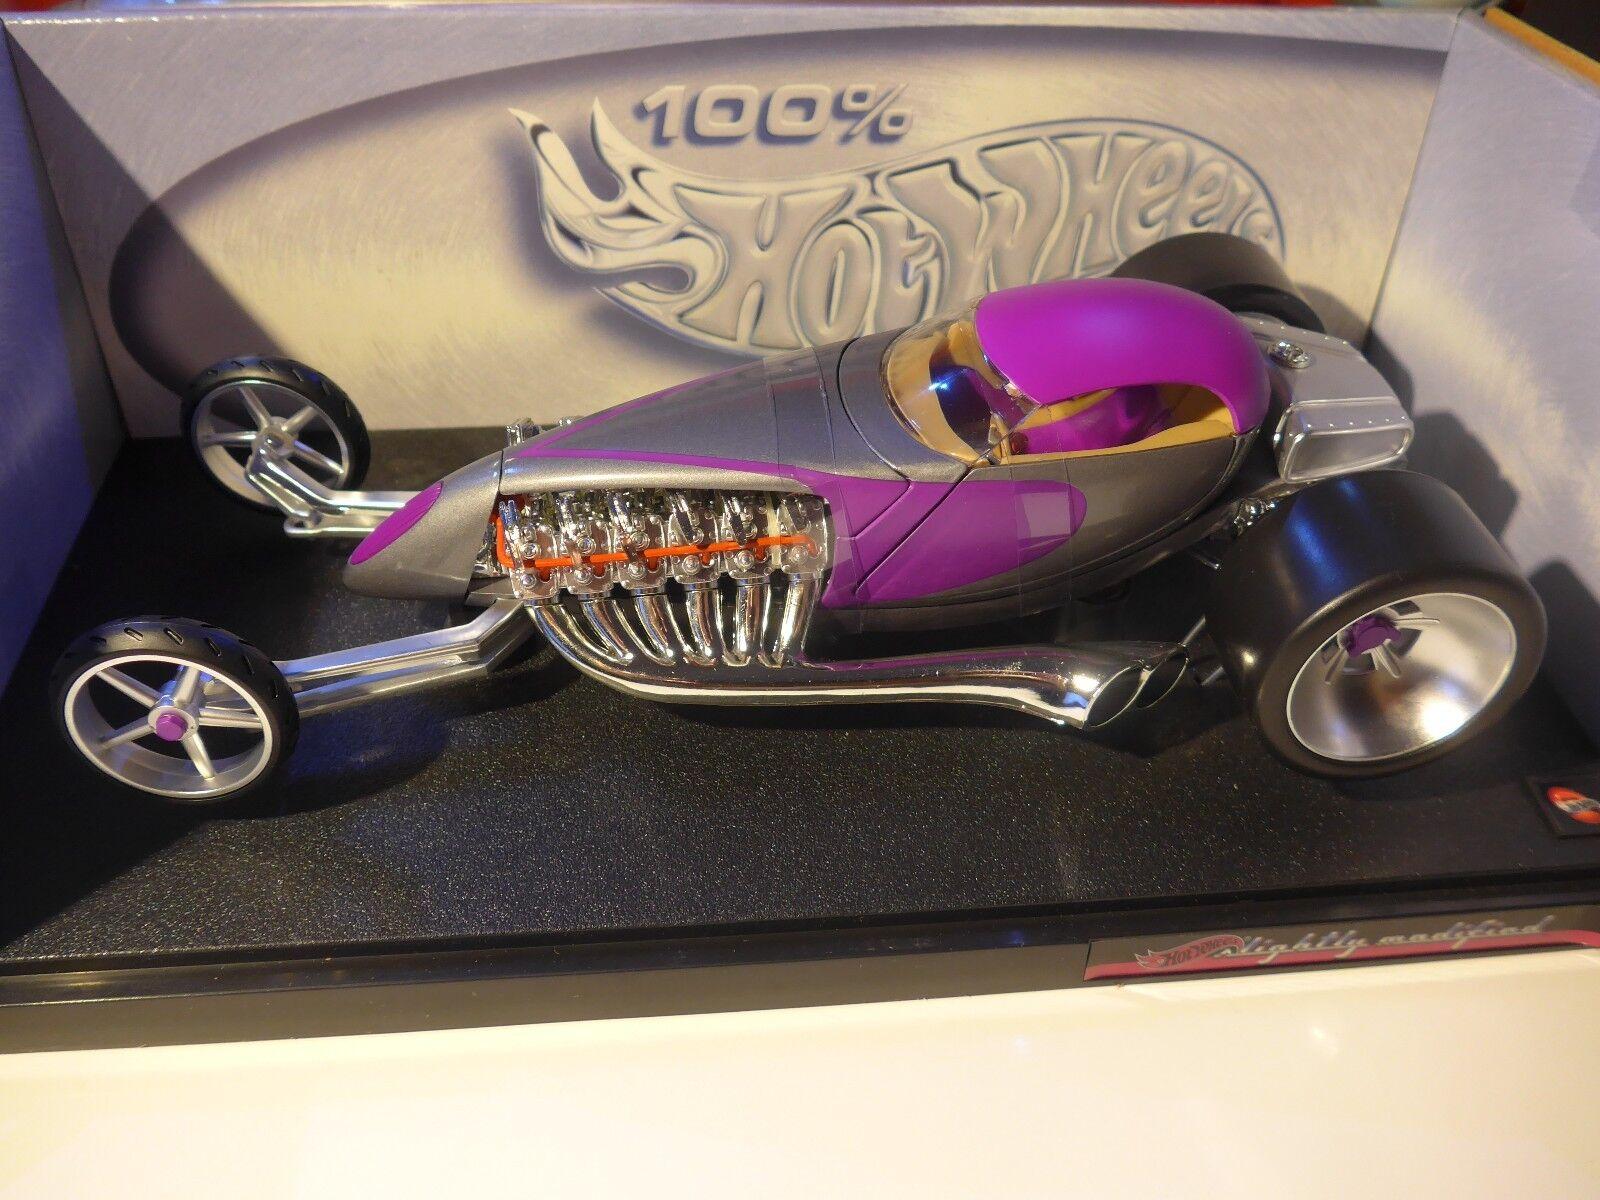 Slightly Modified diecast model 1 18 scale by Hotwheels